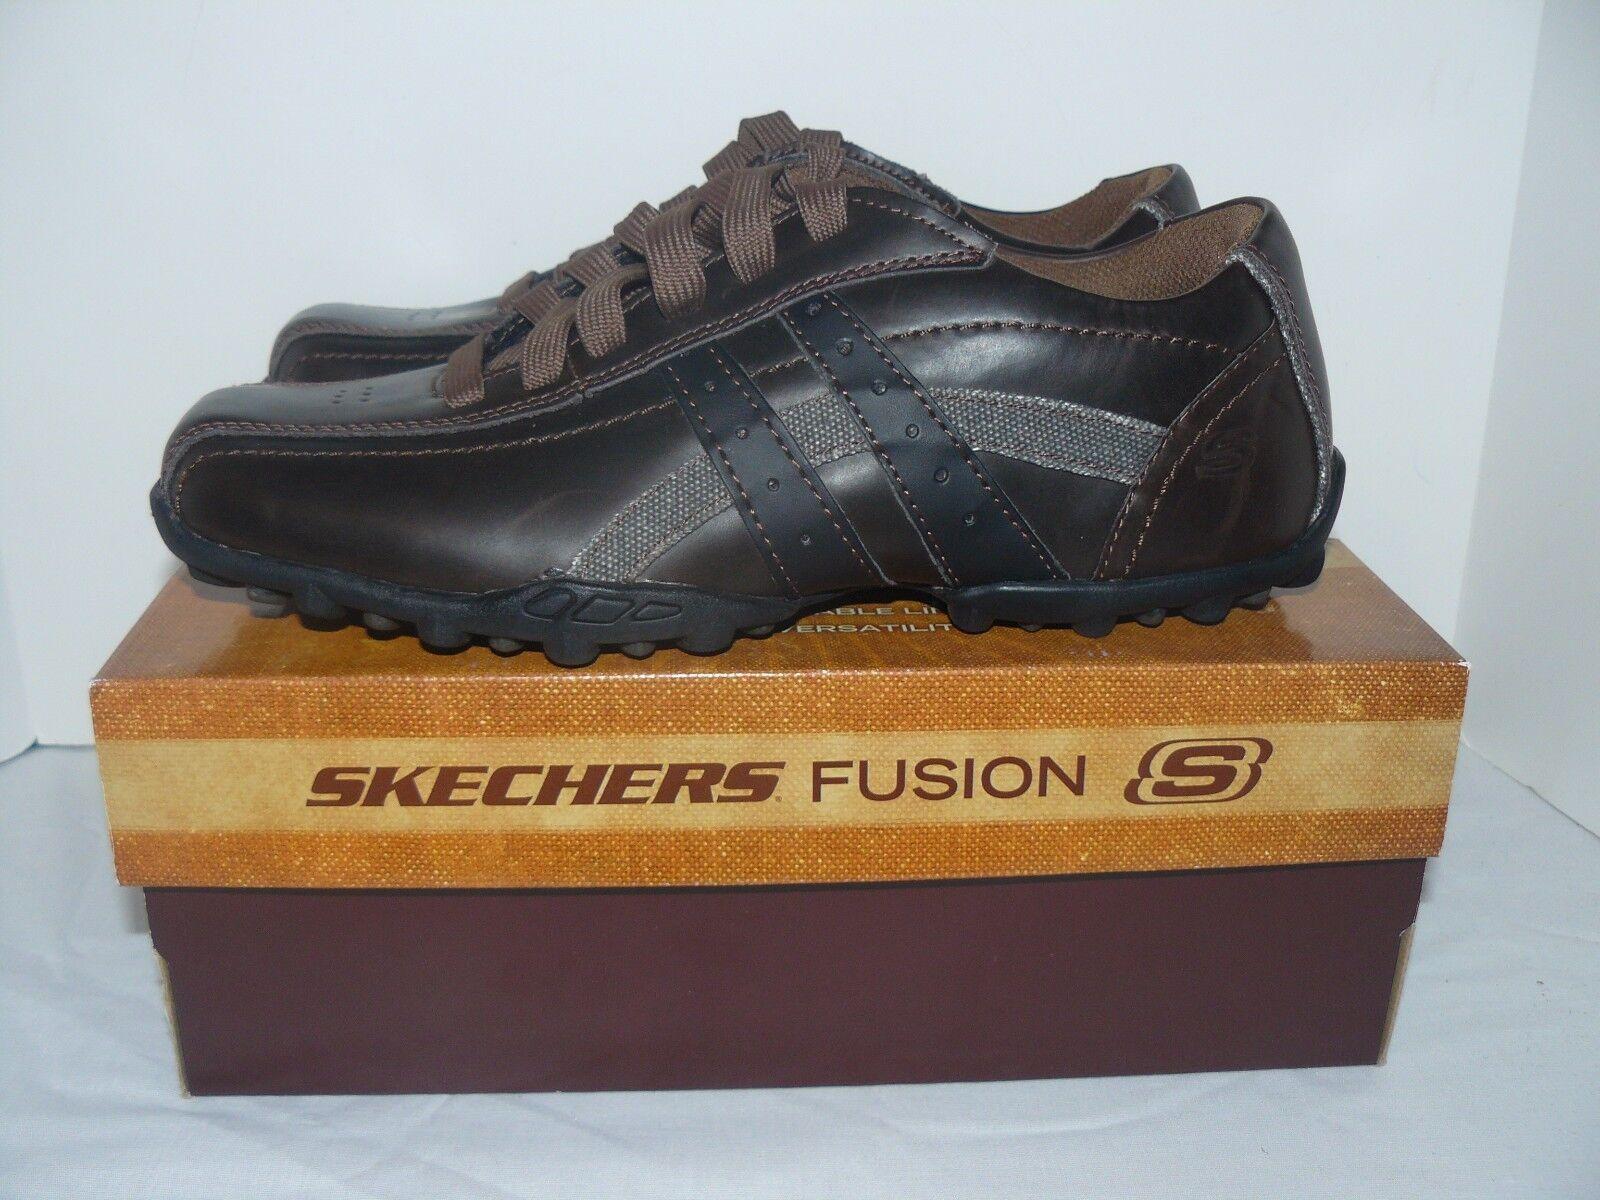 NIB Uomo Skechers Fusion Talus-Burk Casual Shoes 8, 8.5, 9.5, 10, 10.5, 11, 13